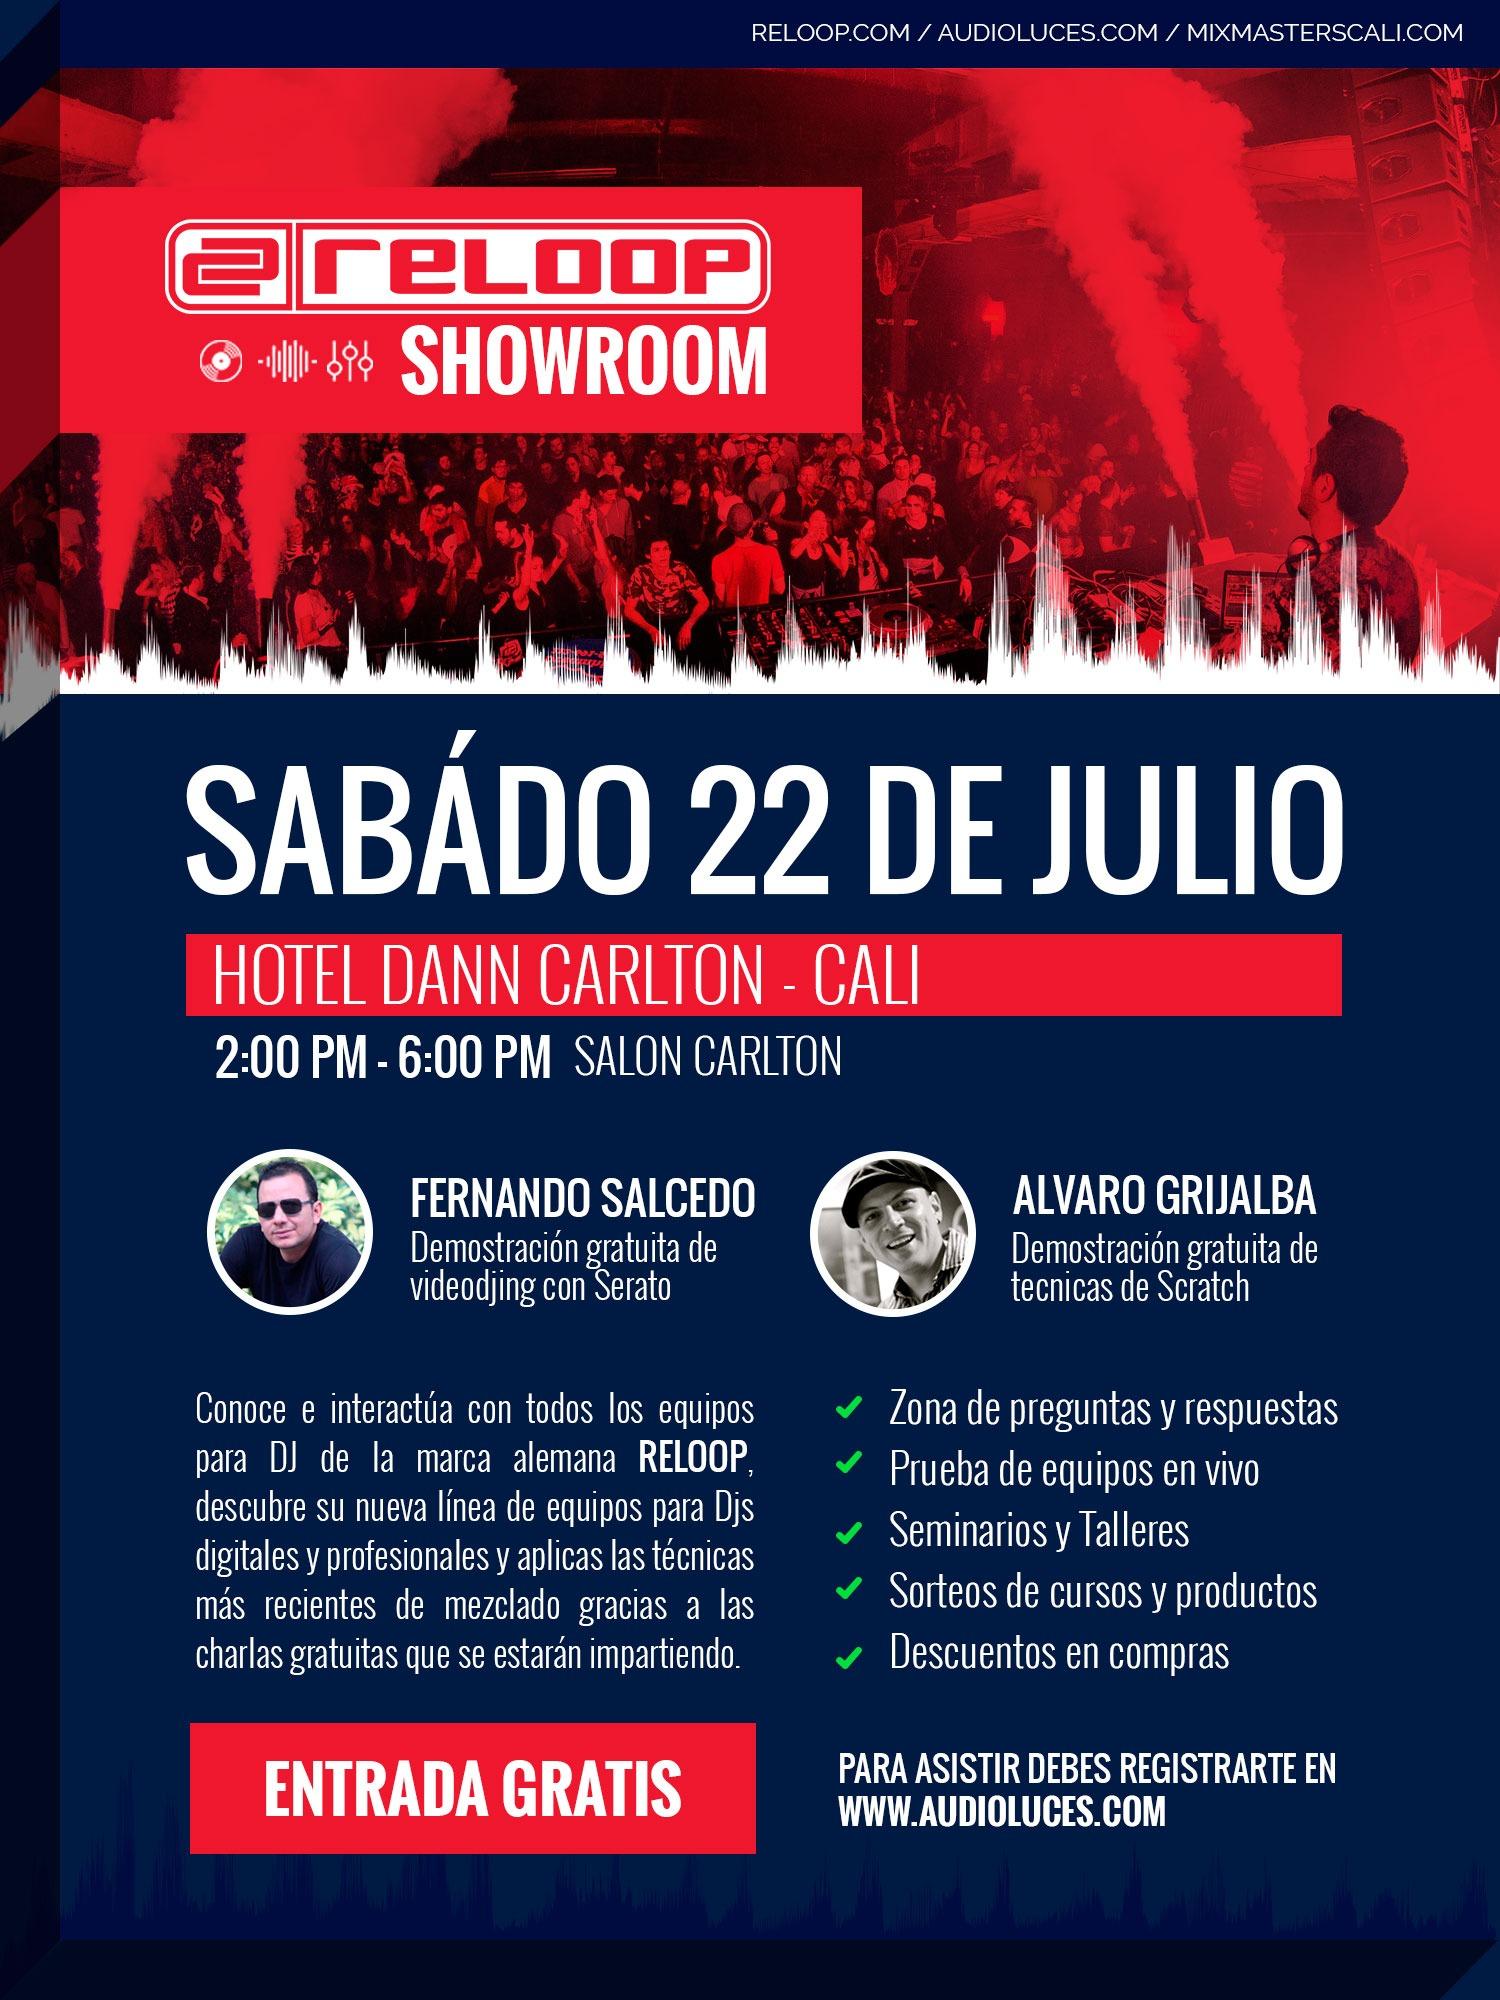 RELOOP SHOWROOM - 22 DE JULIO HOTEL DANN CARLTON